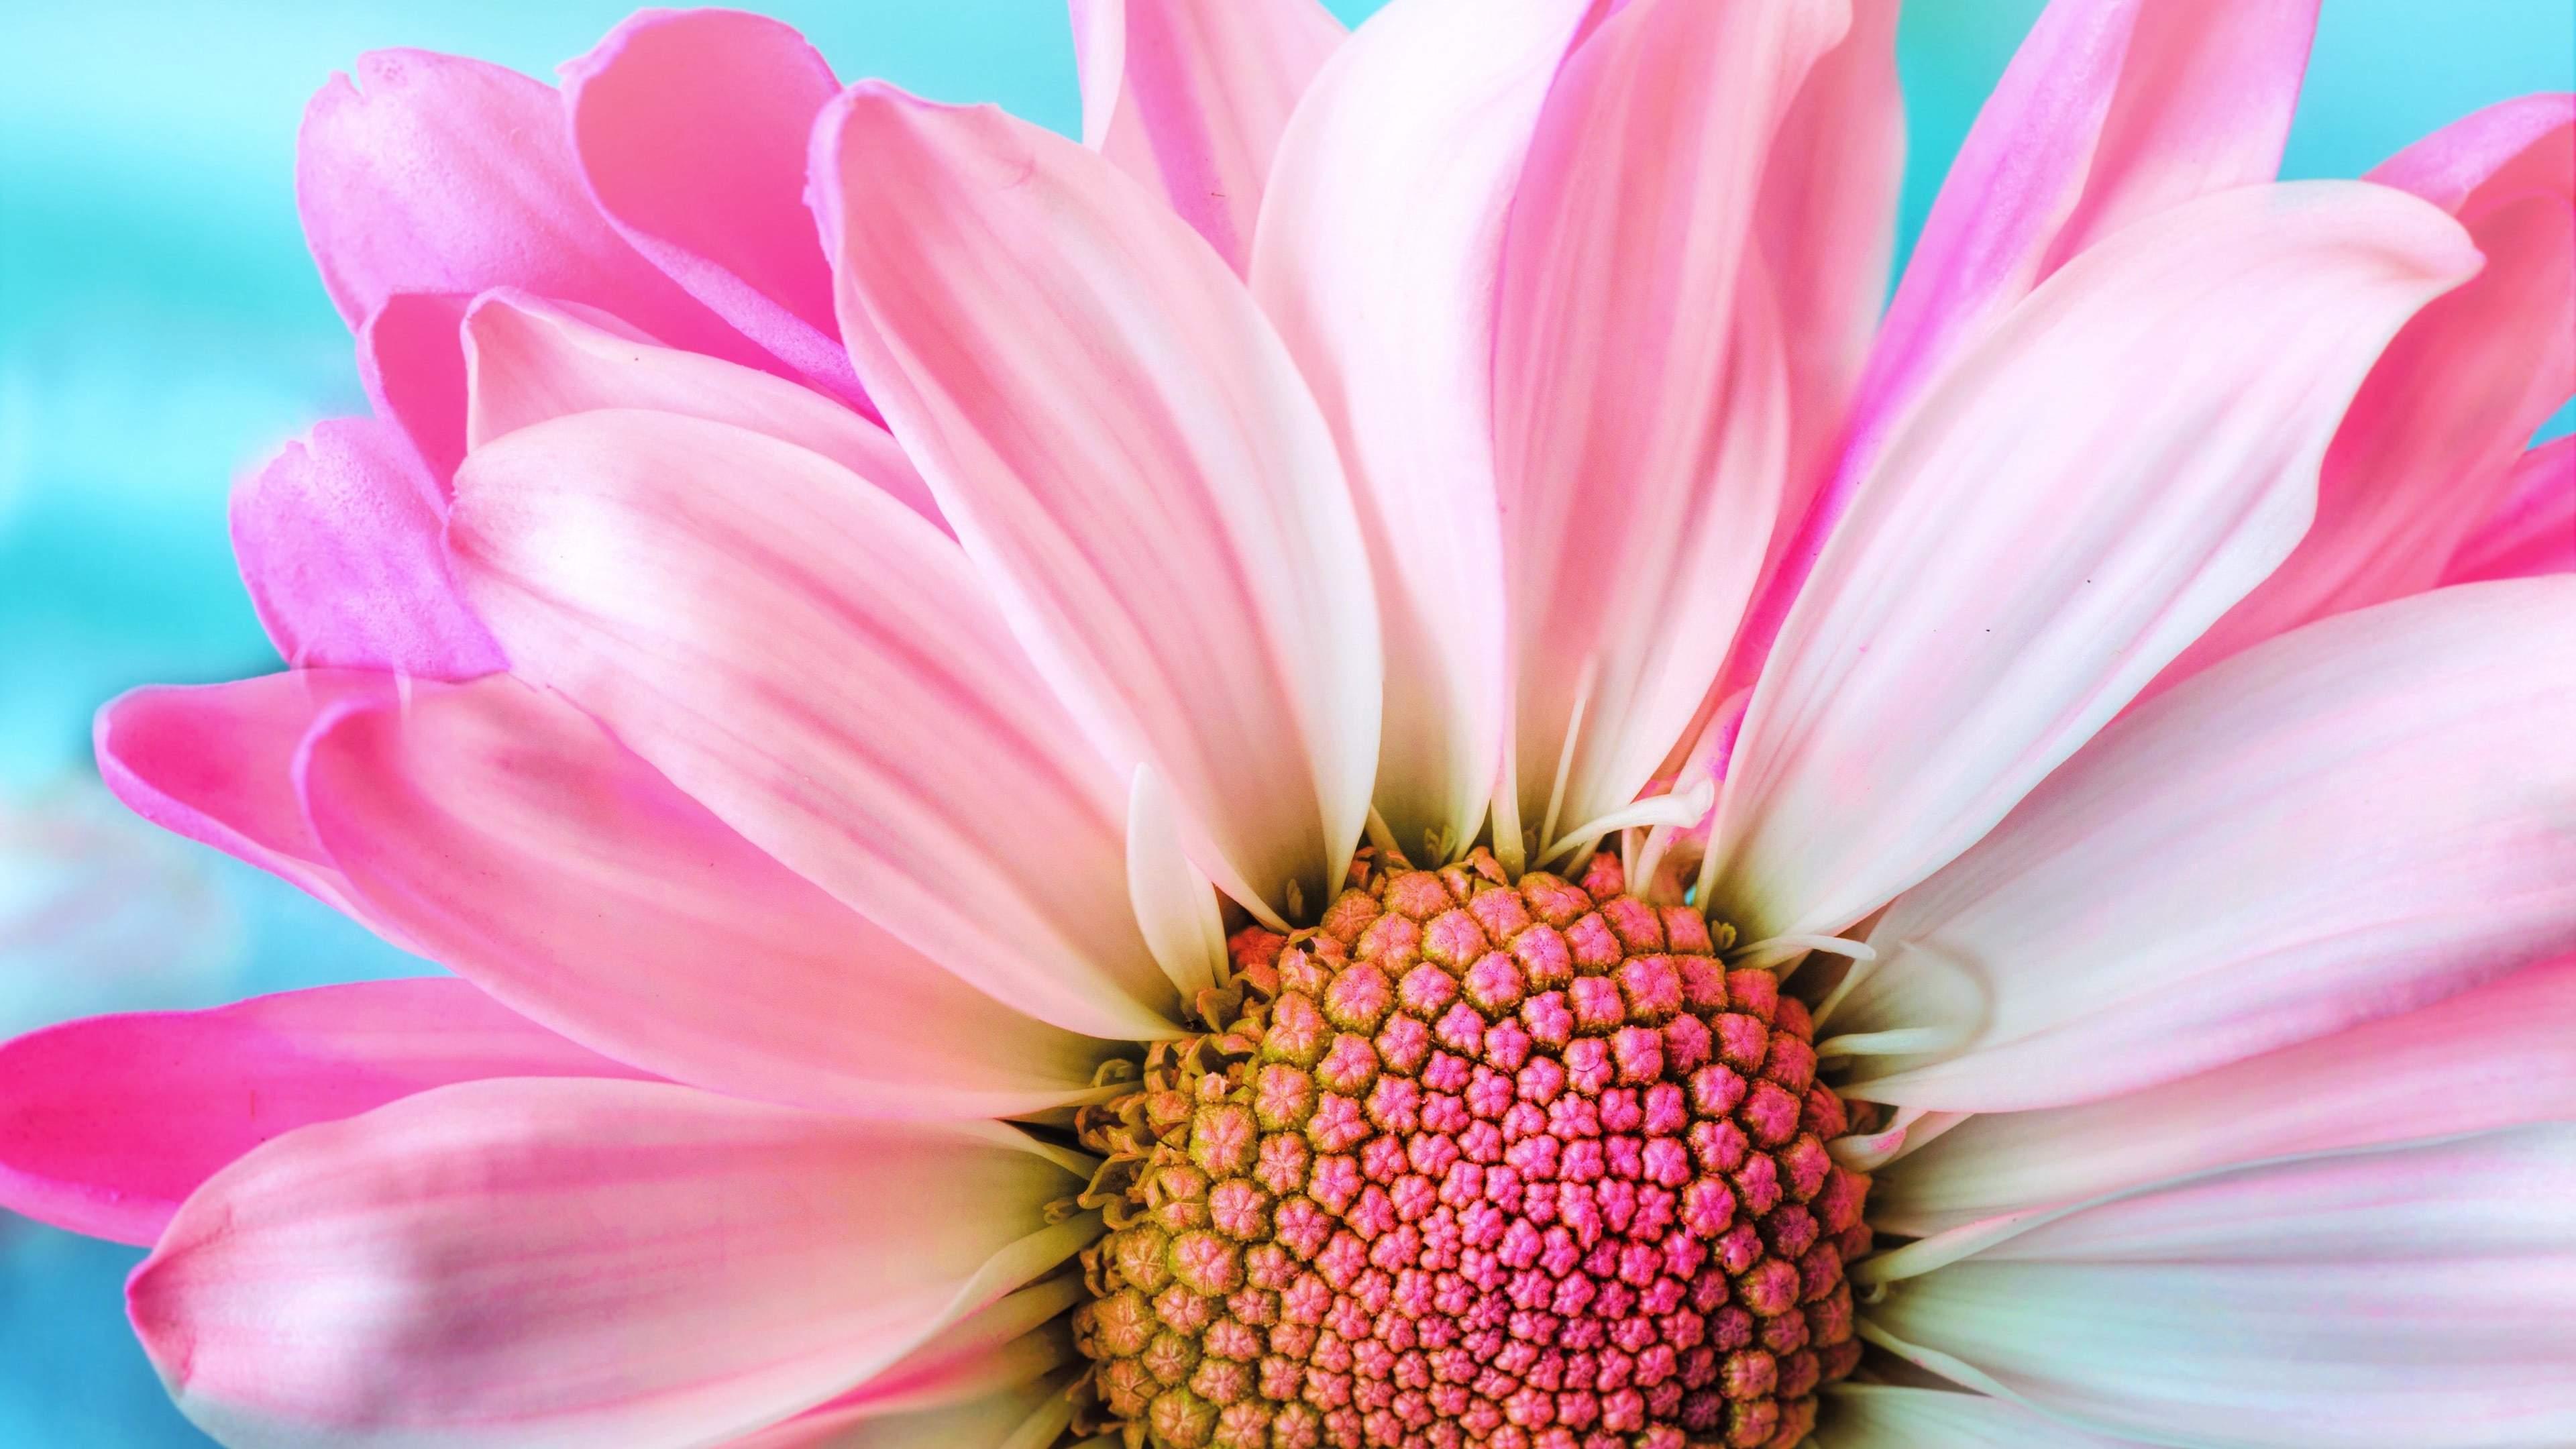 Çiçek Testi Compressjpeg.com